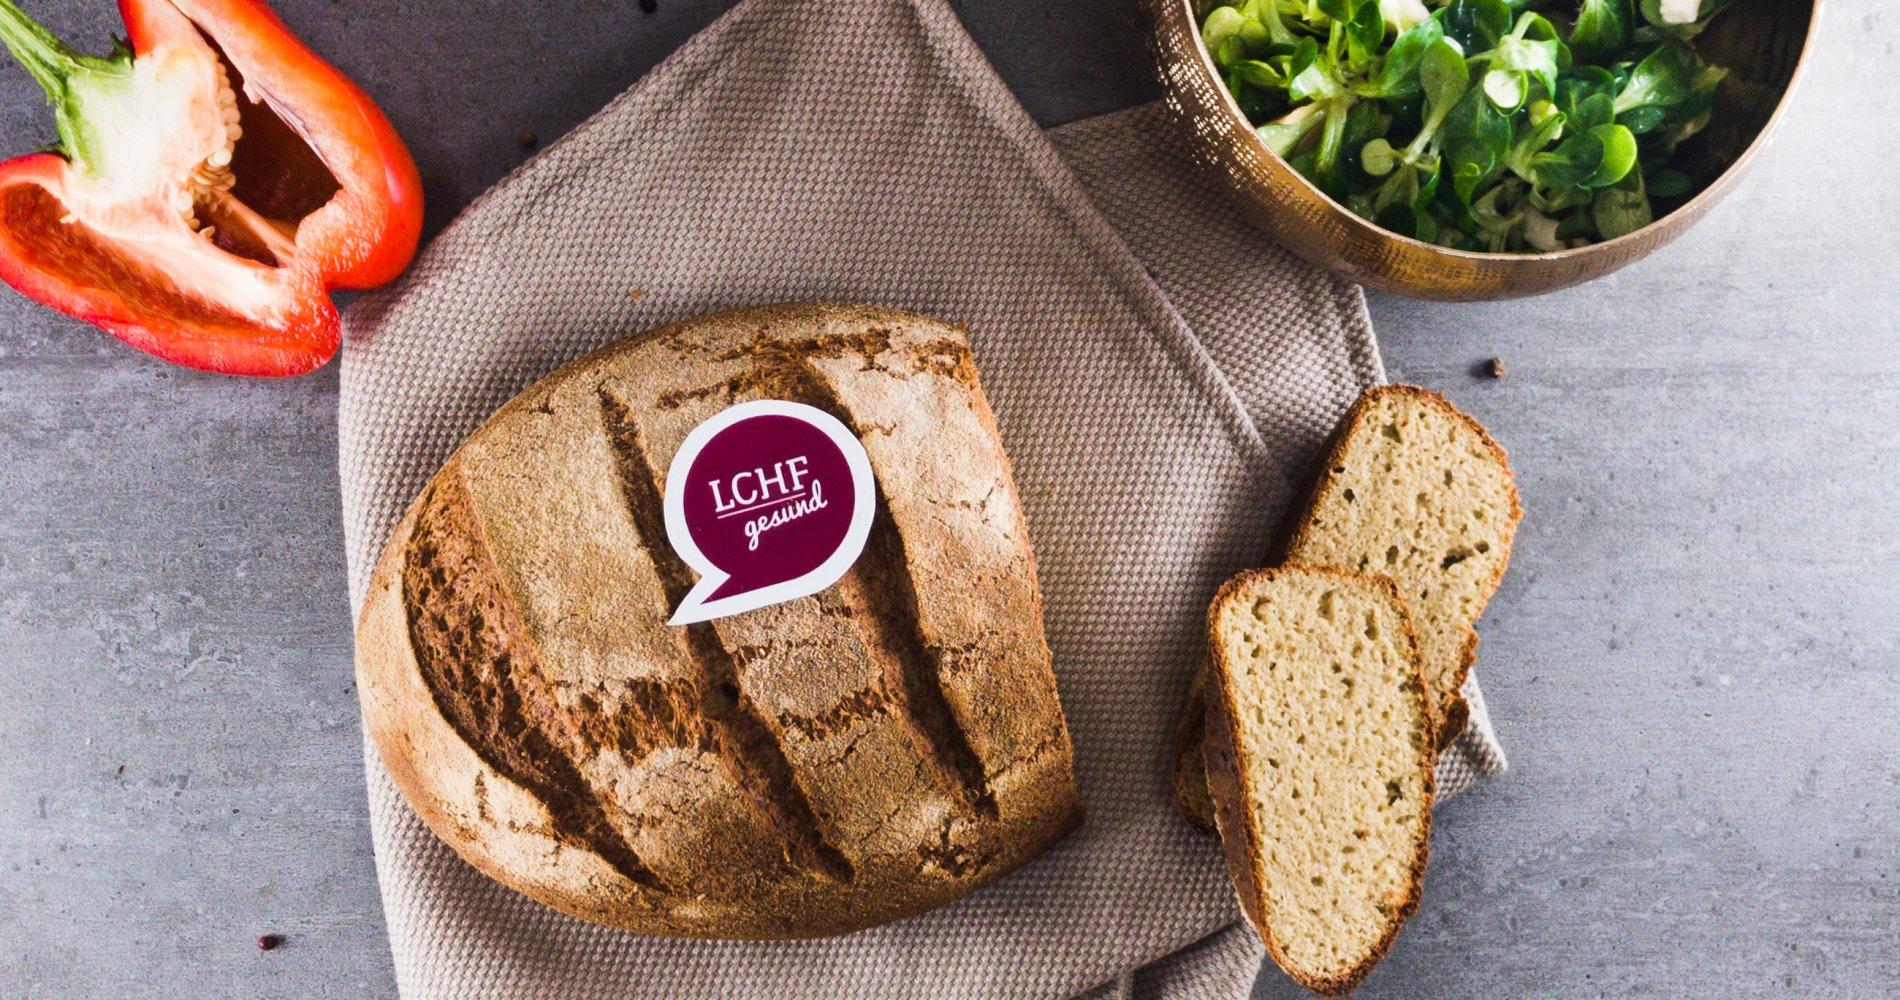 Rezept Low Carb: Kartoffel-Flohsamenbrot - LCHF-gesund.de